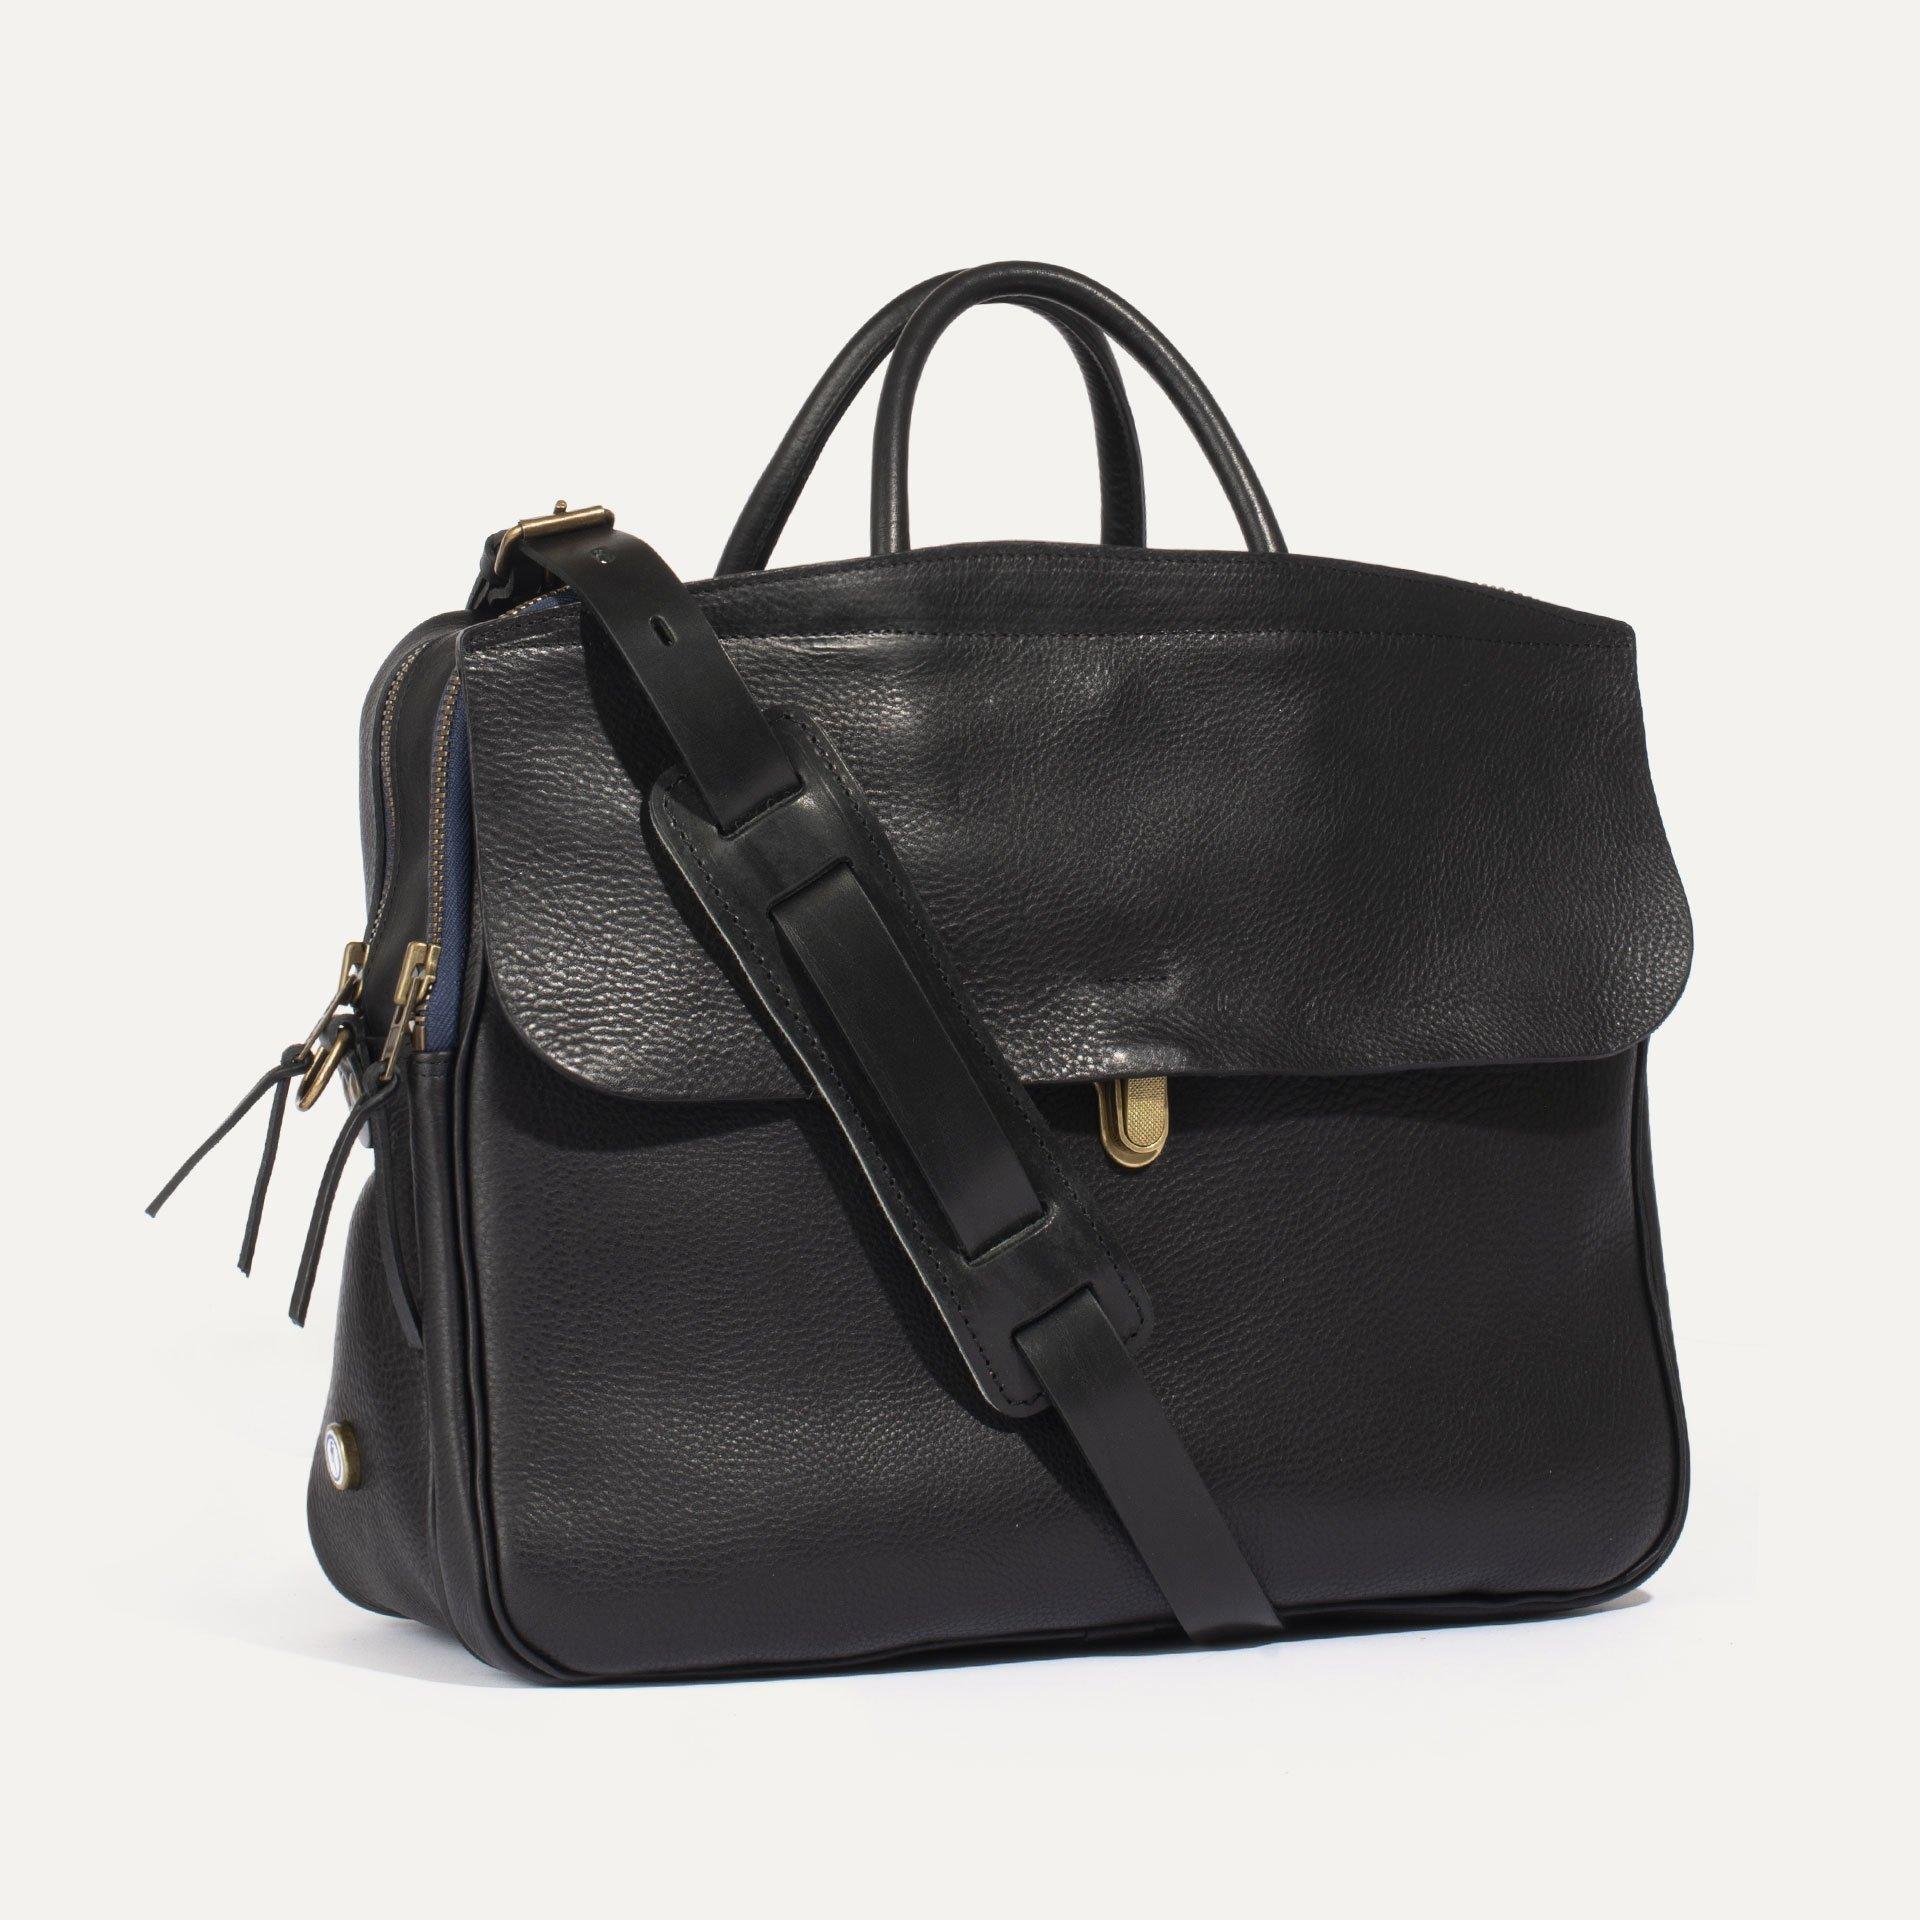 Zeppo Business bag - Black / E Pure (image n°2)